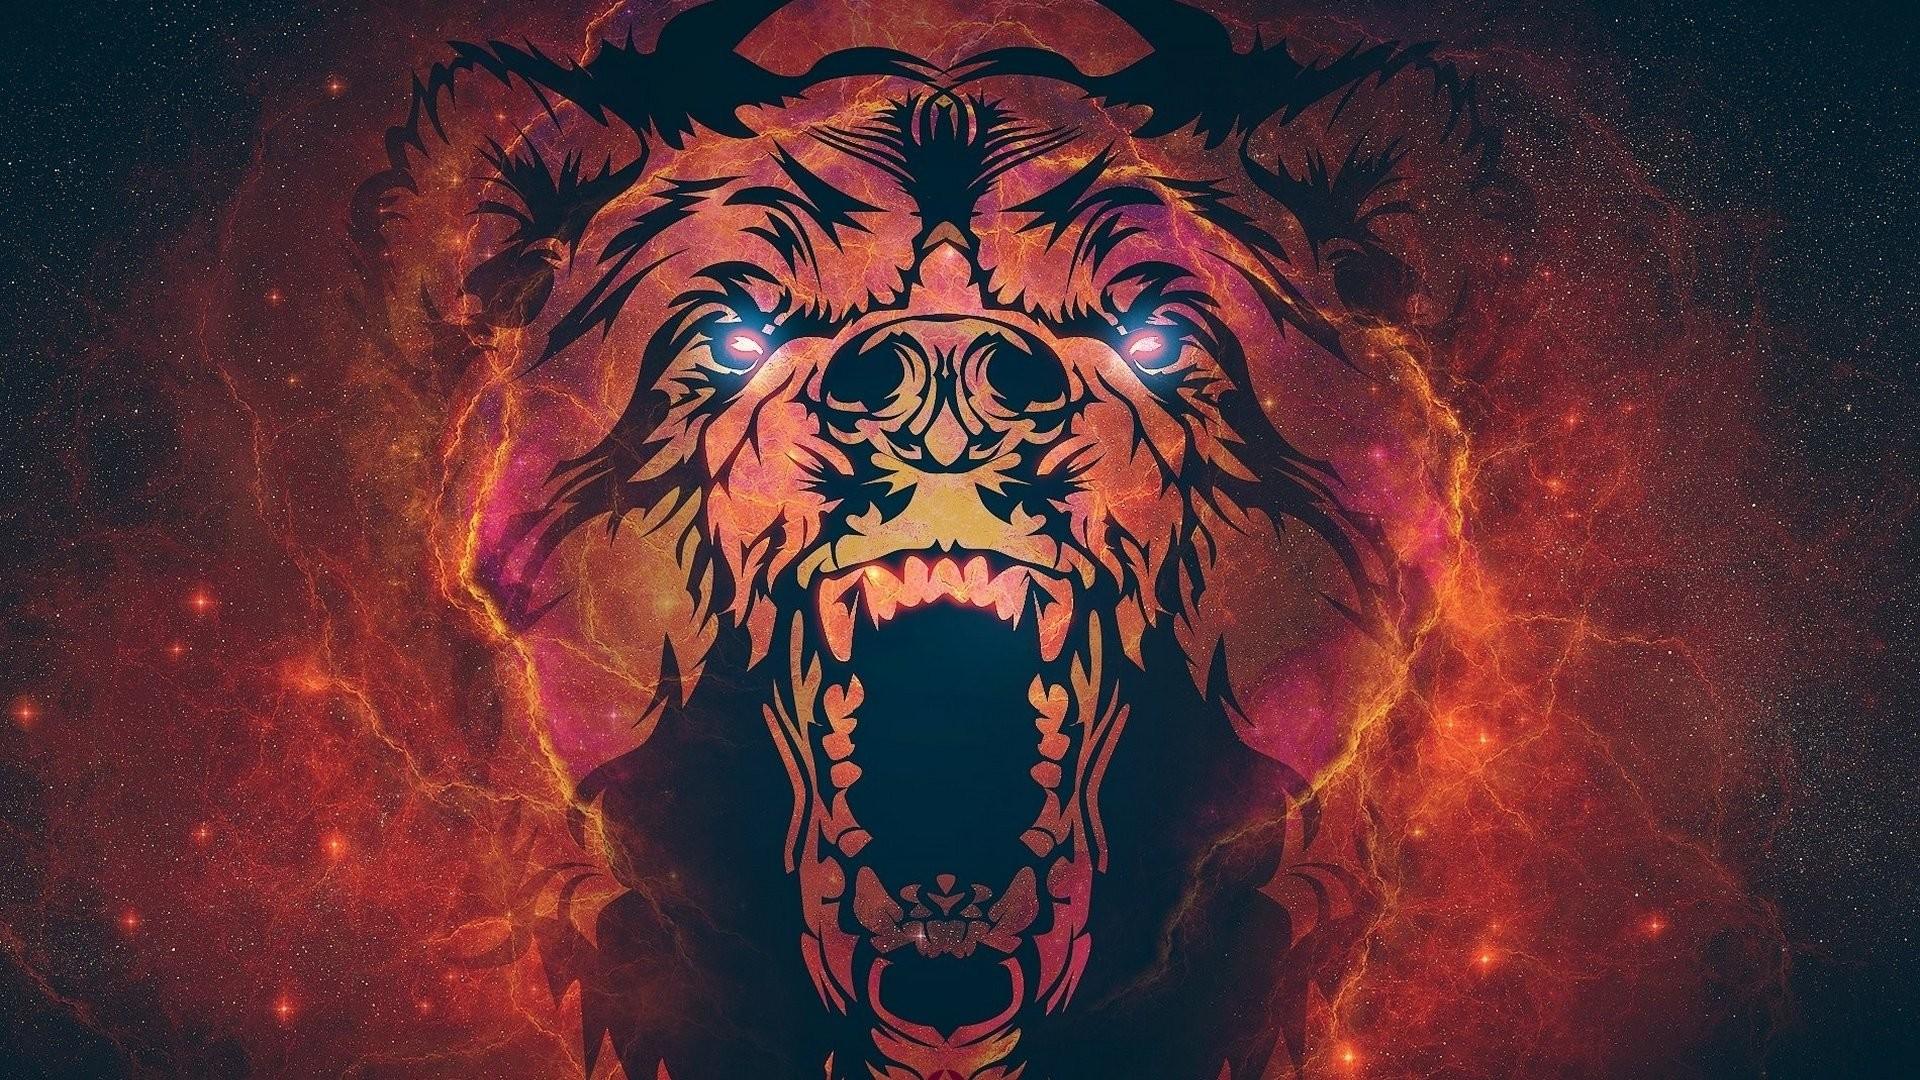 xpx Bear Wallpaper wallpaper for desktop